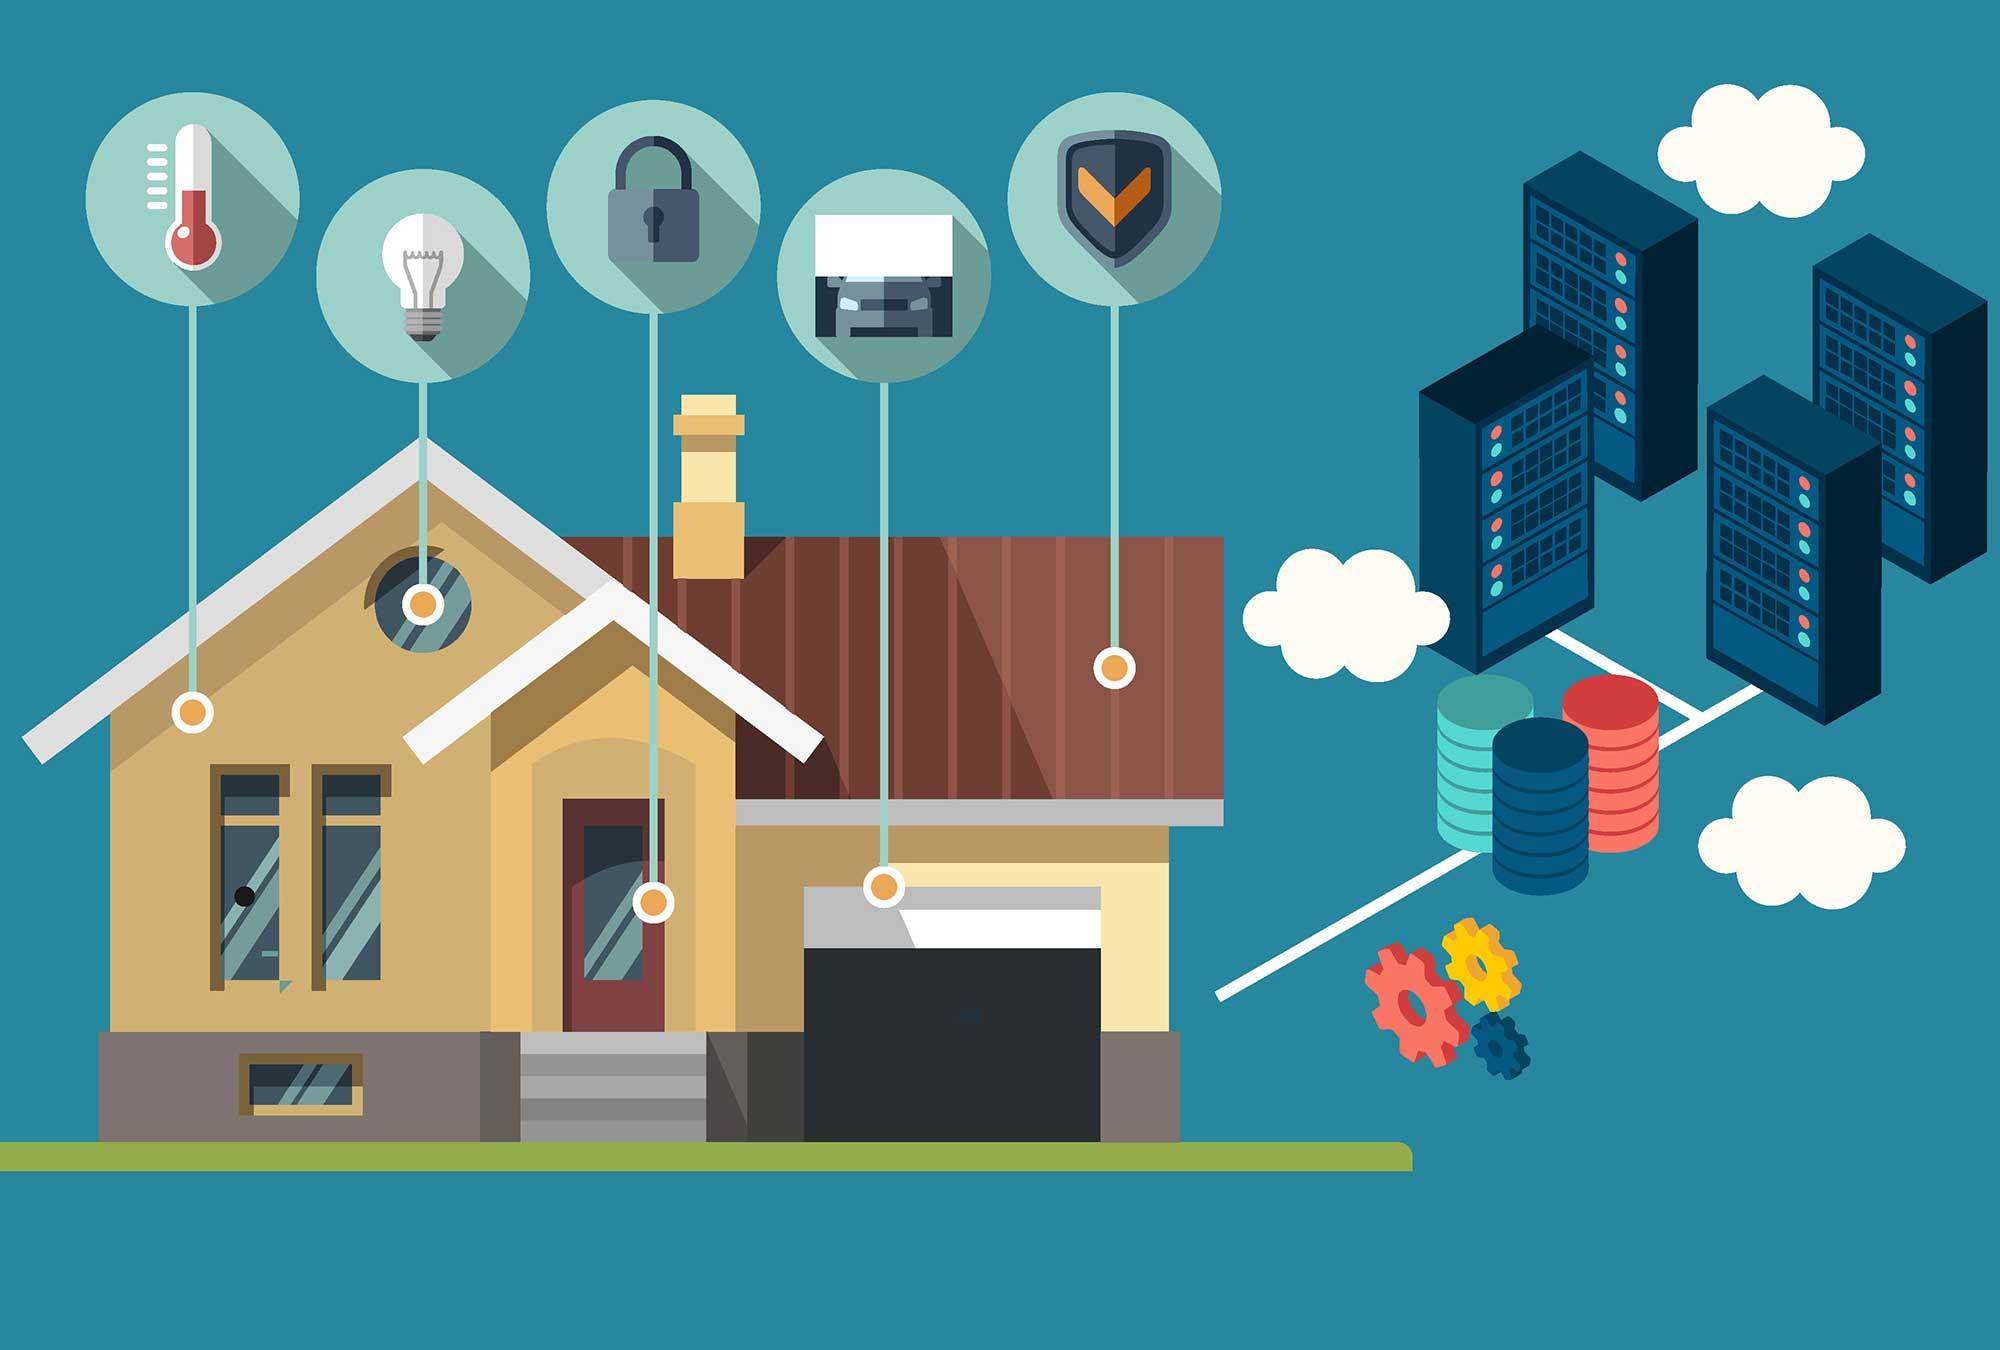 Six Ways IoT Will Impact Data Centers